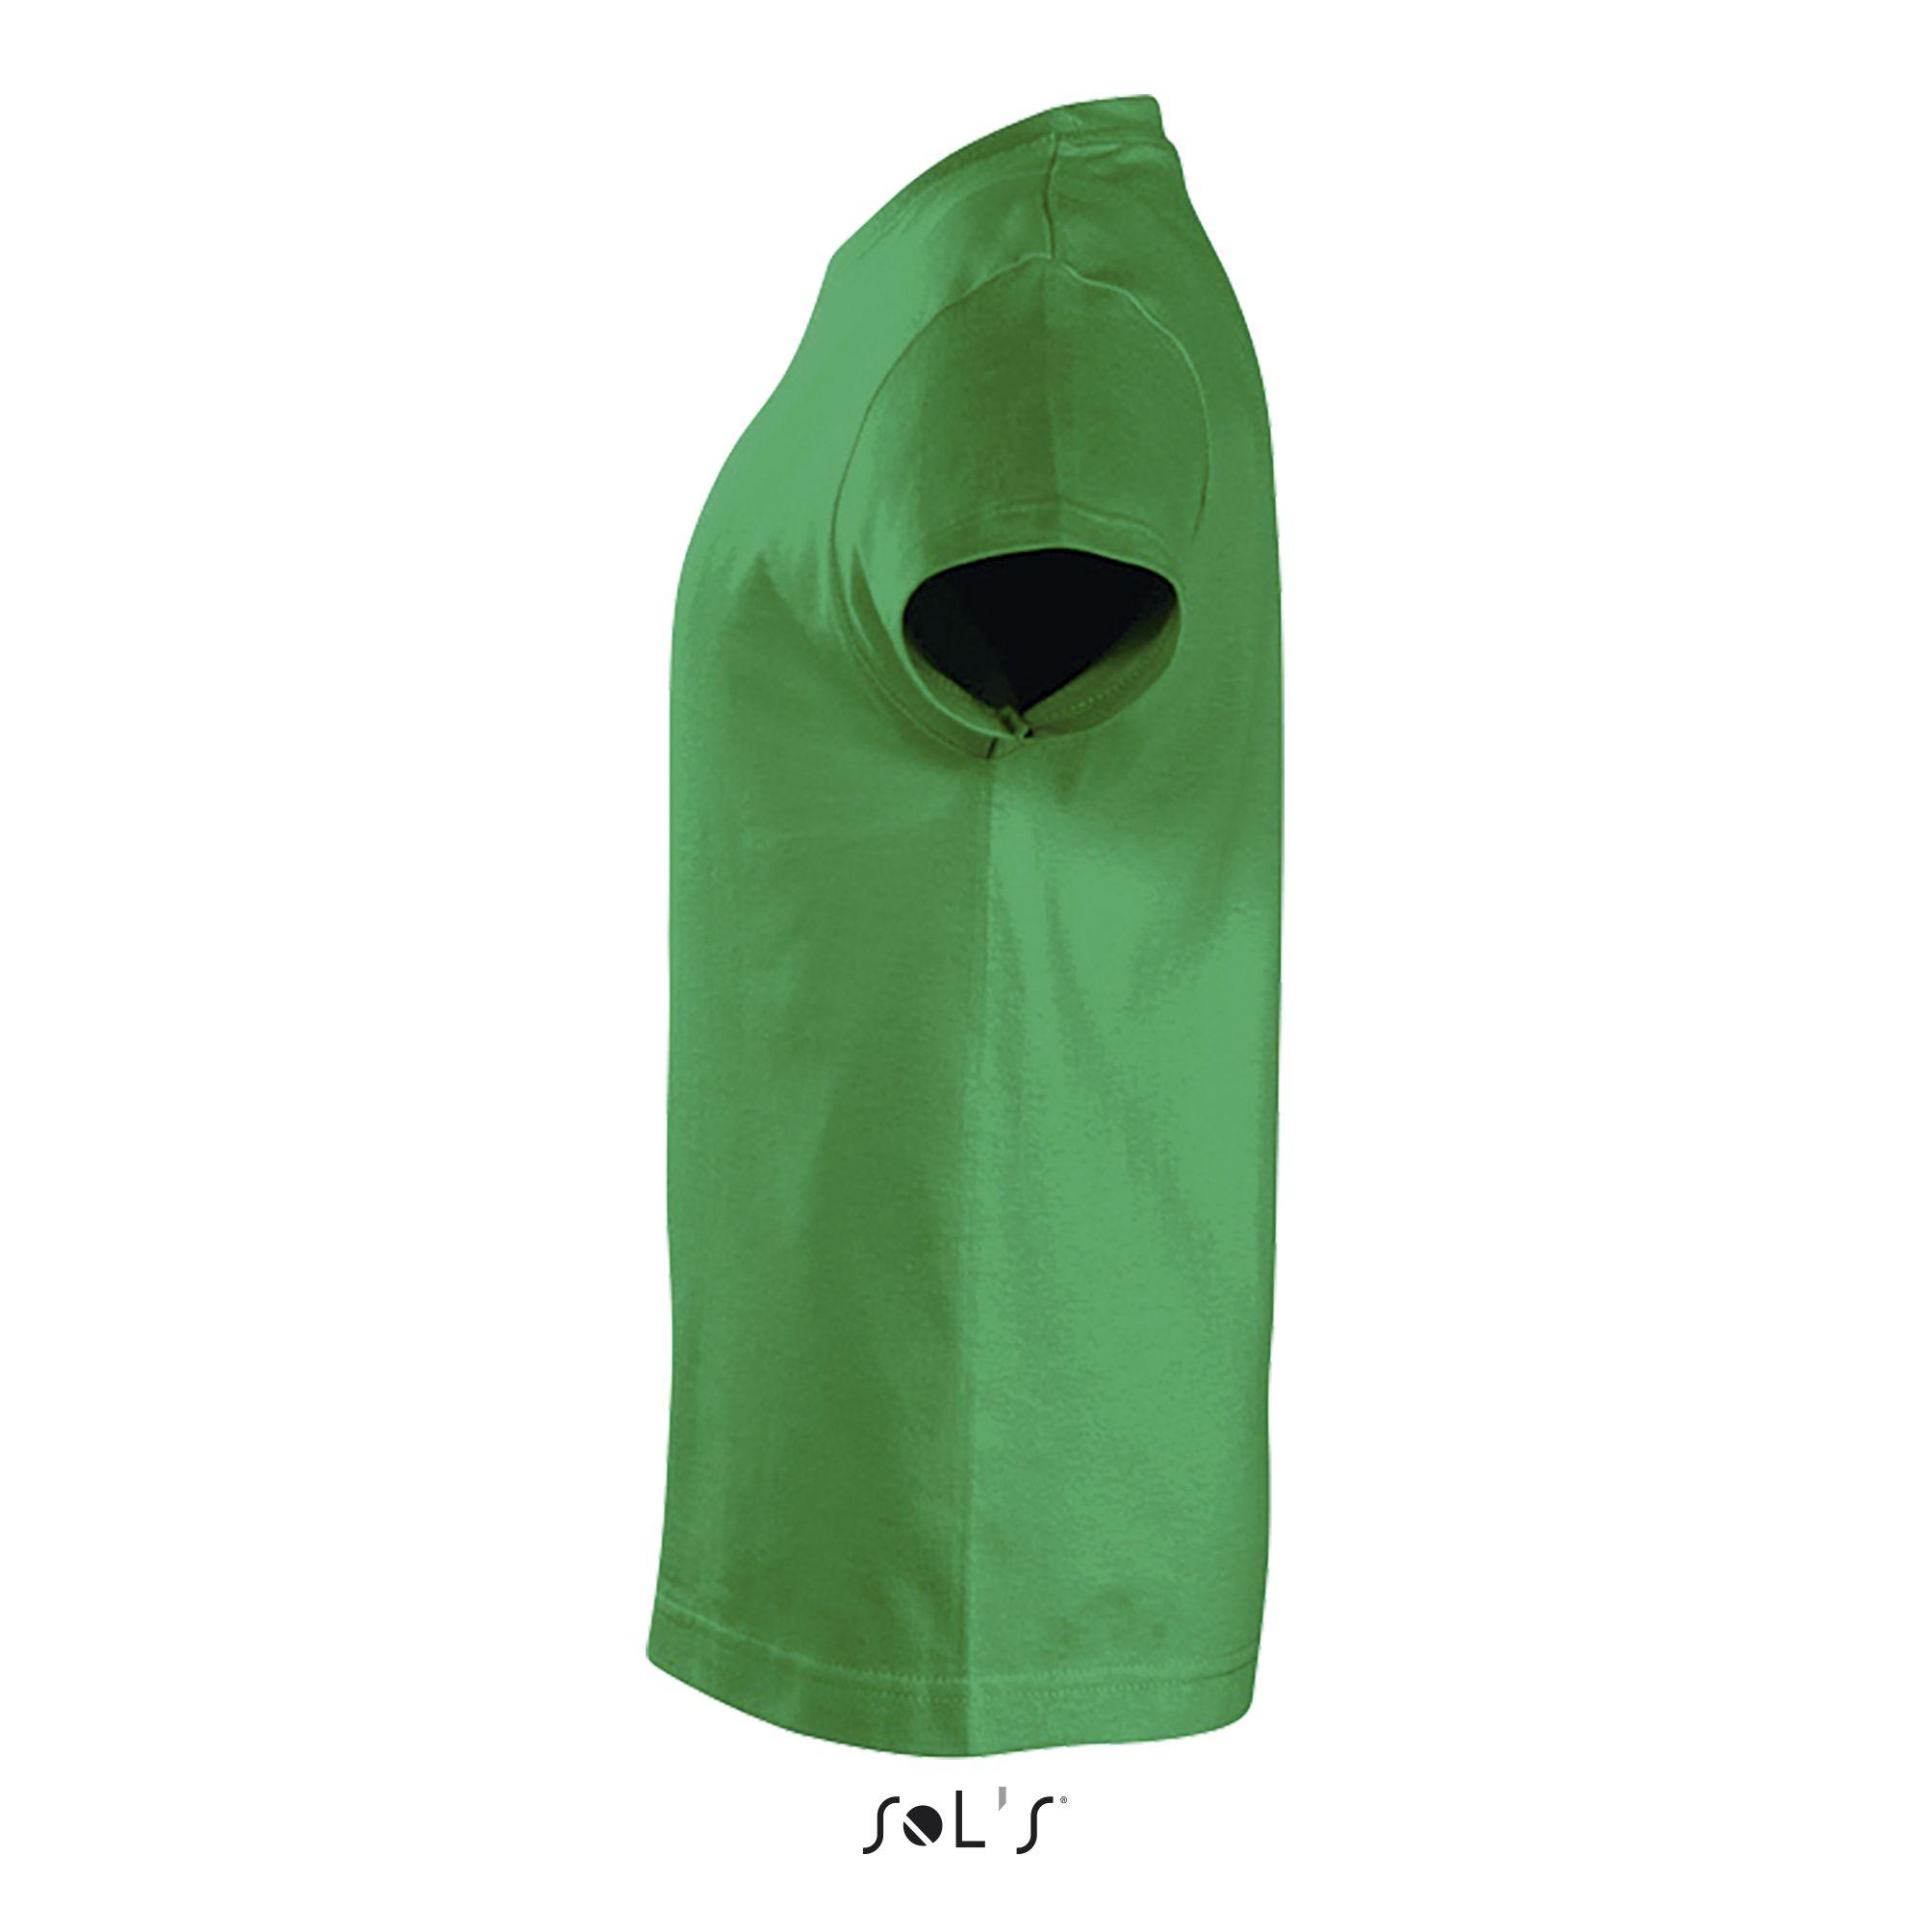 272 - Kelly green